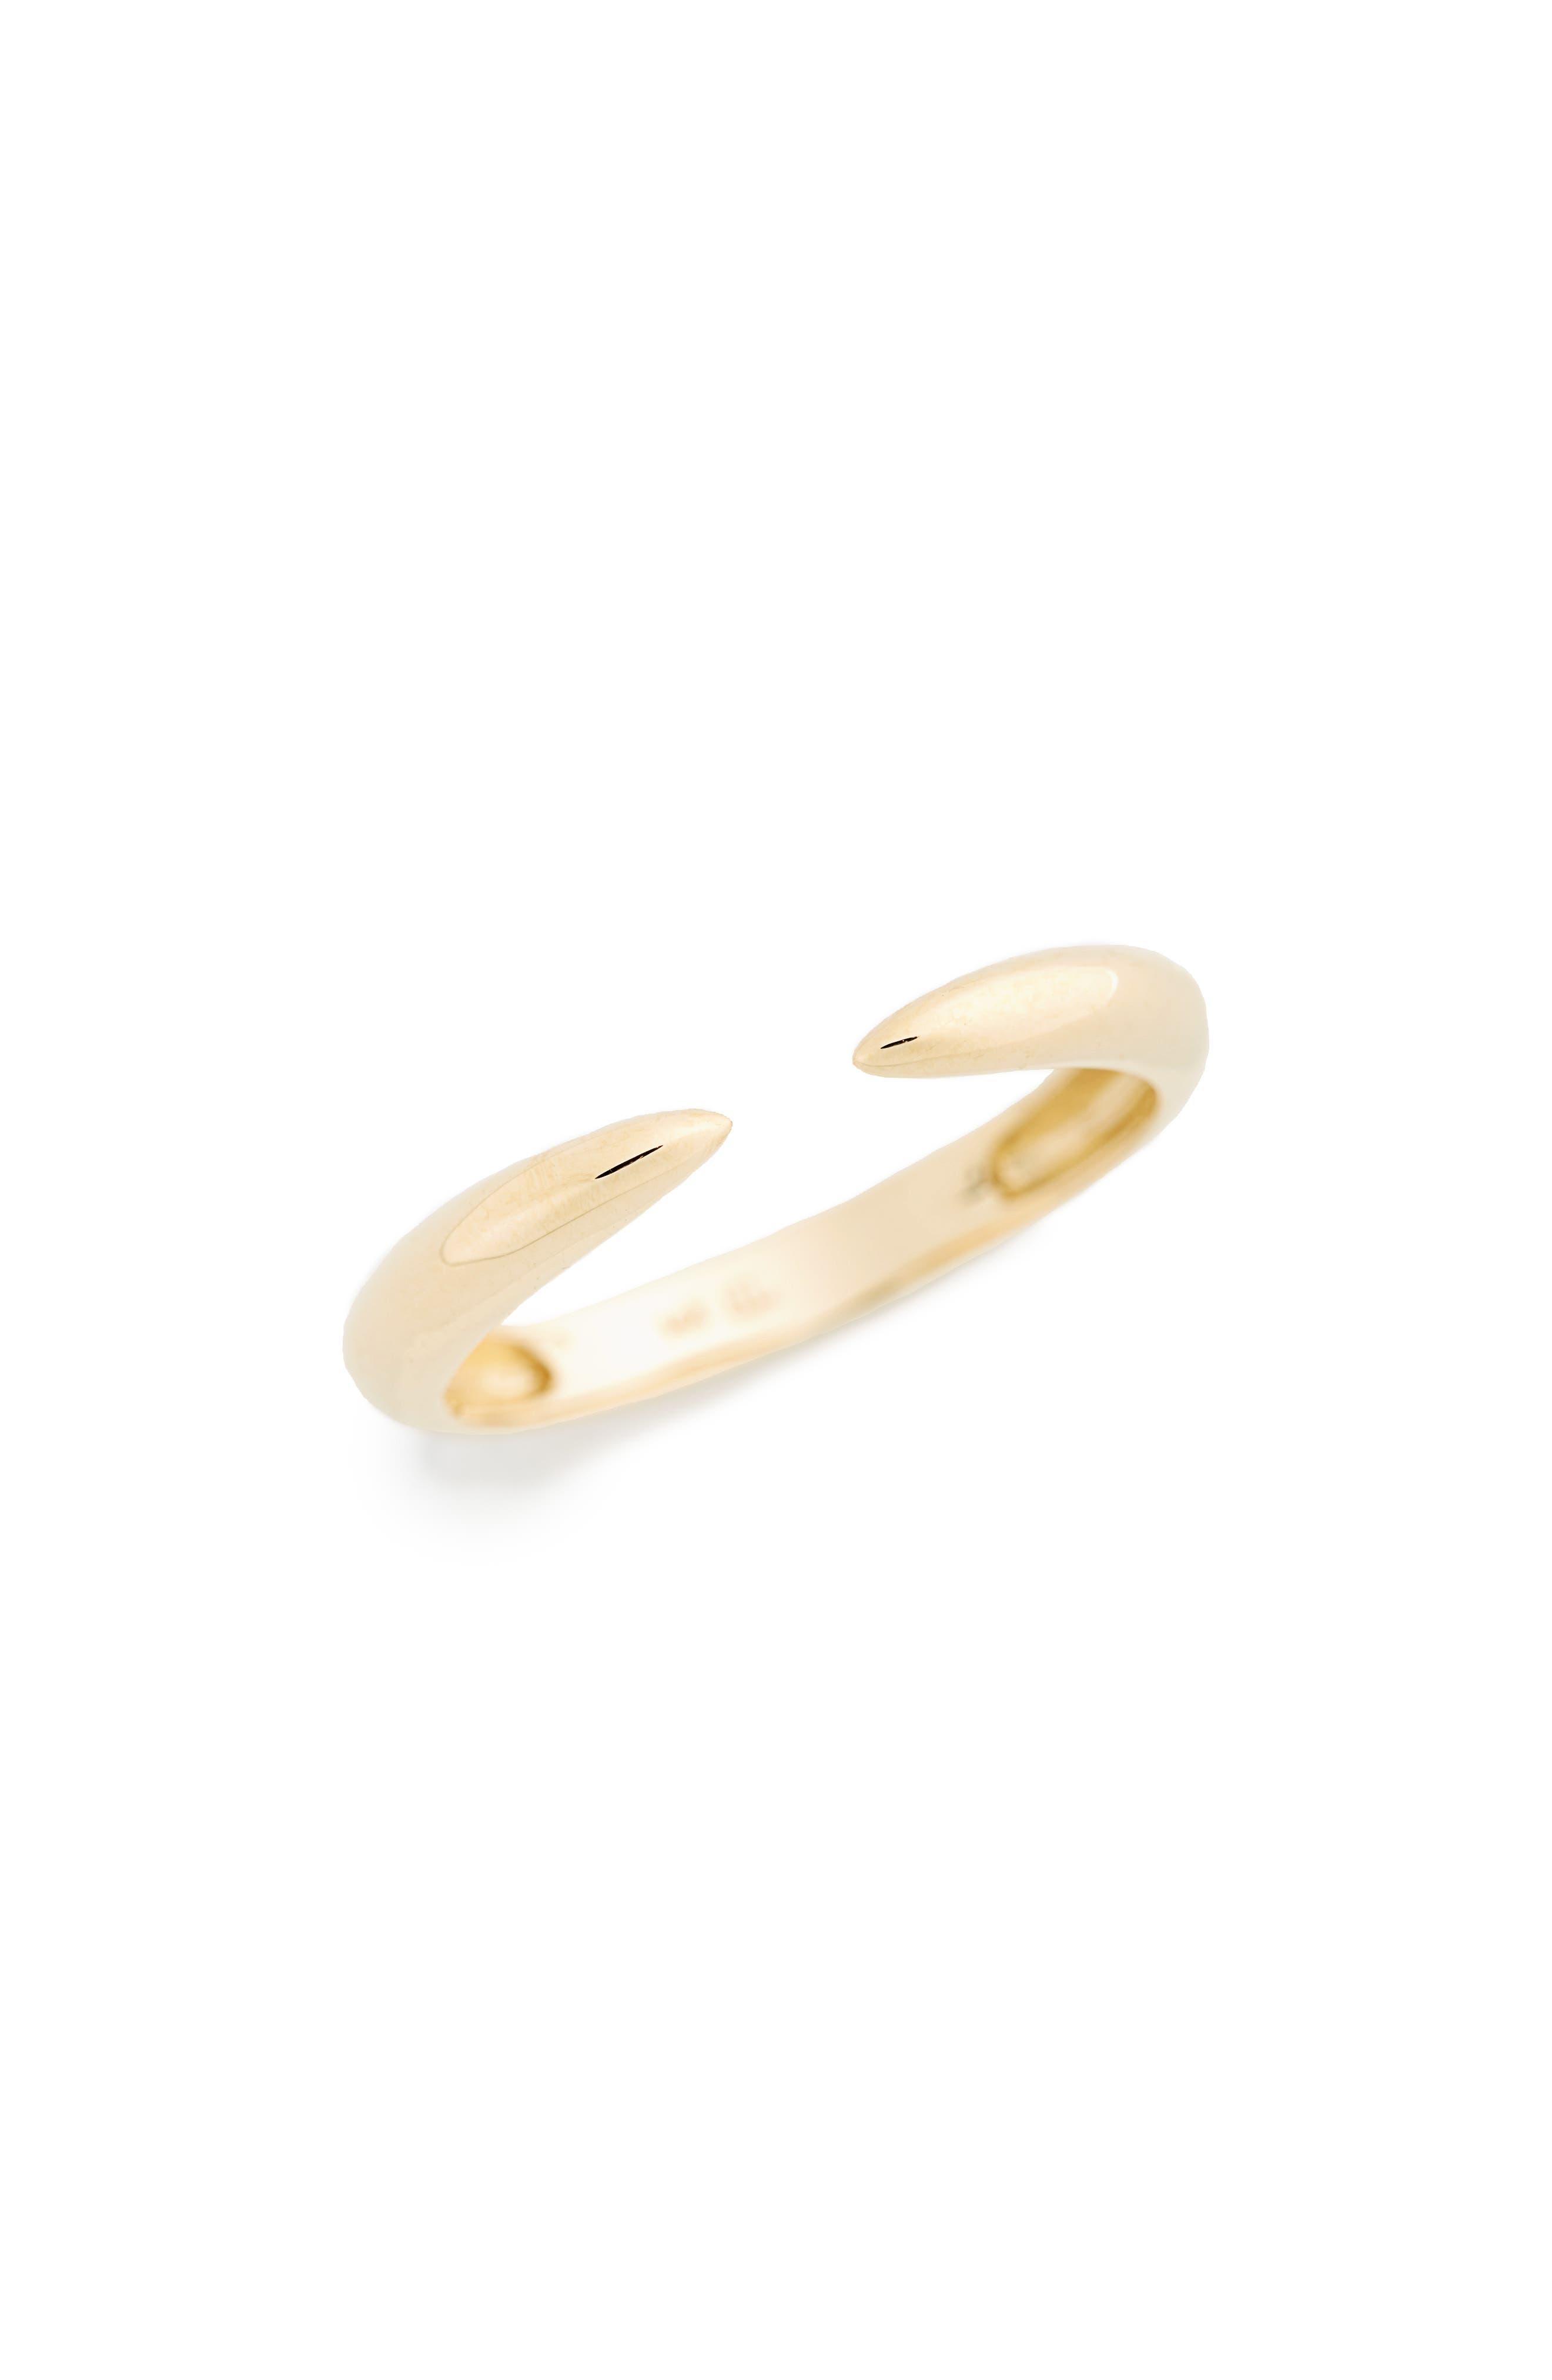 Ofira Small 14K Open Cuff Ring,                             Main thumbnail 1, color,                             YELLOW GOLD